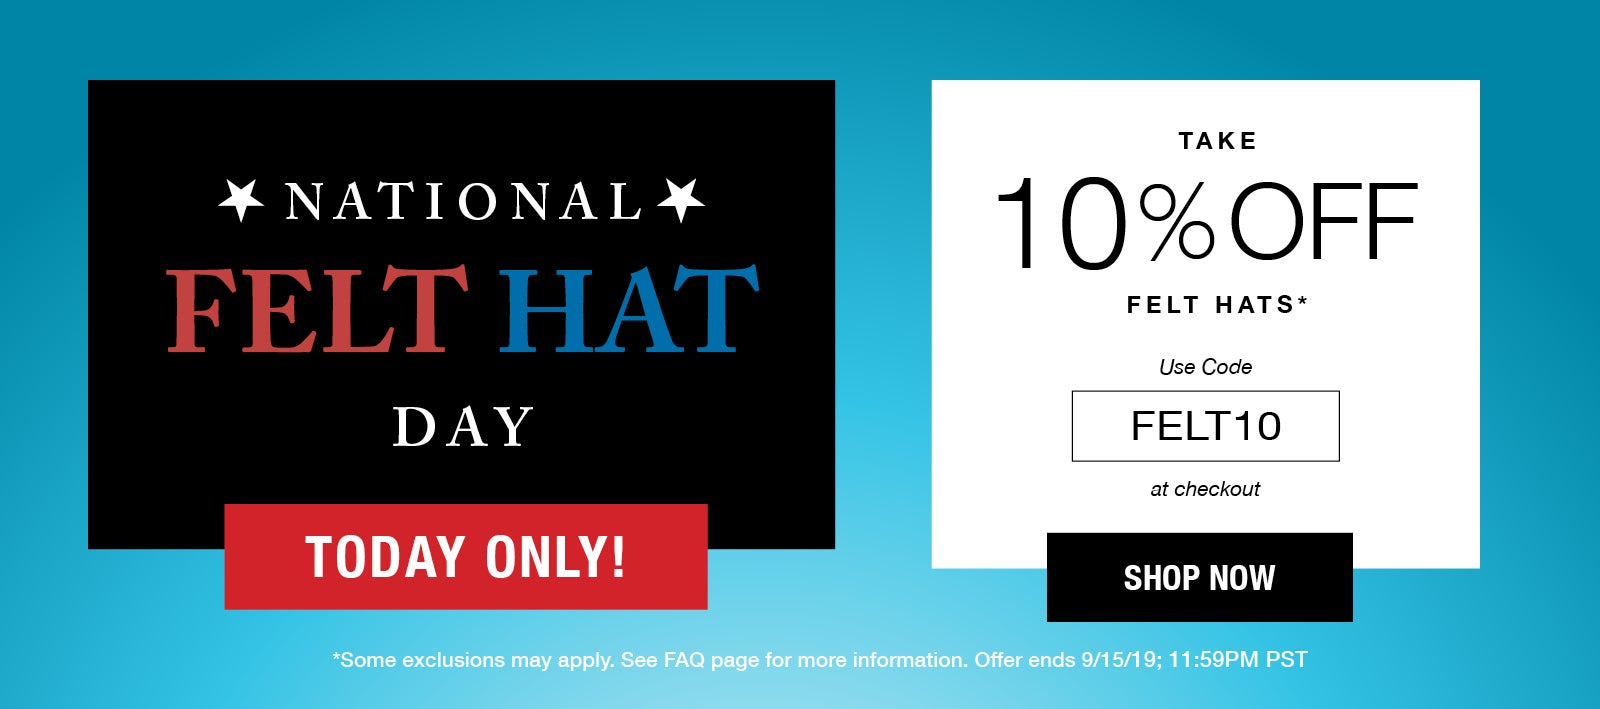 10% Off Felt Hats